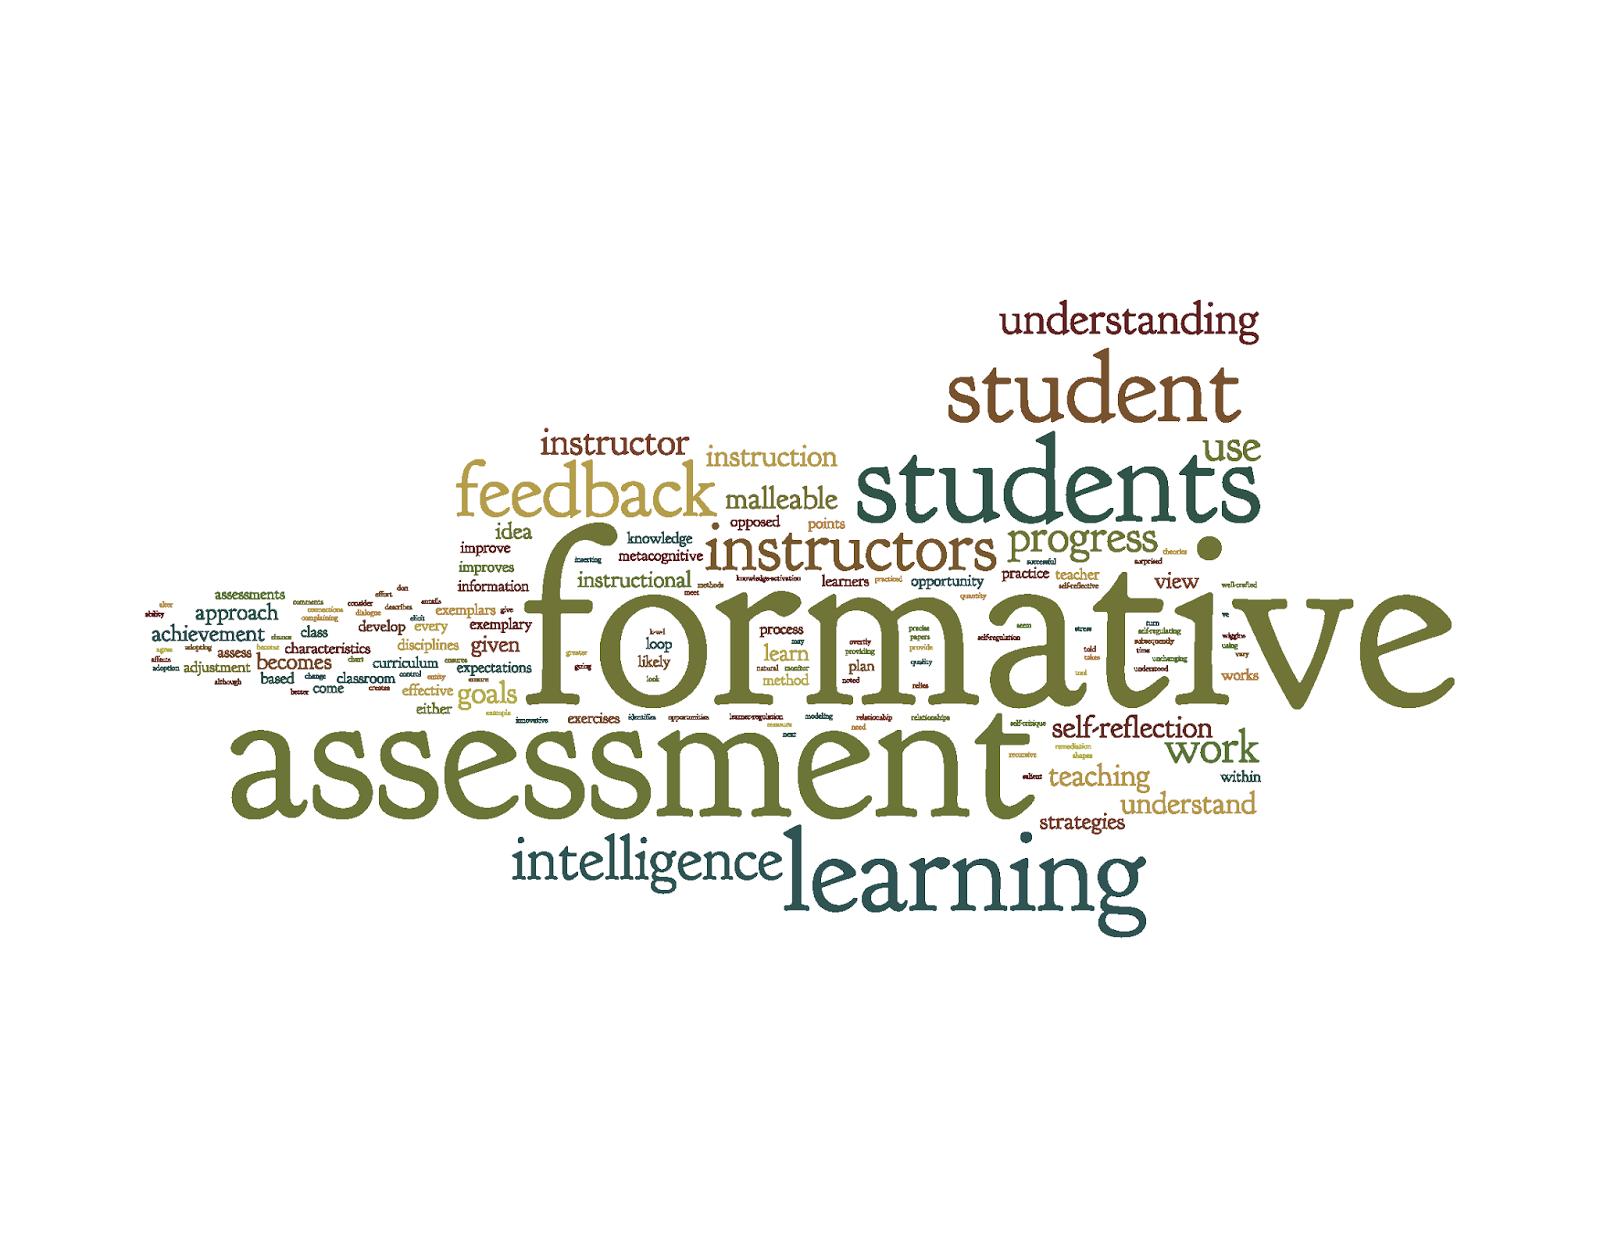 Assessment clipart teacher assessment. The power of formative